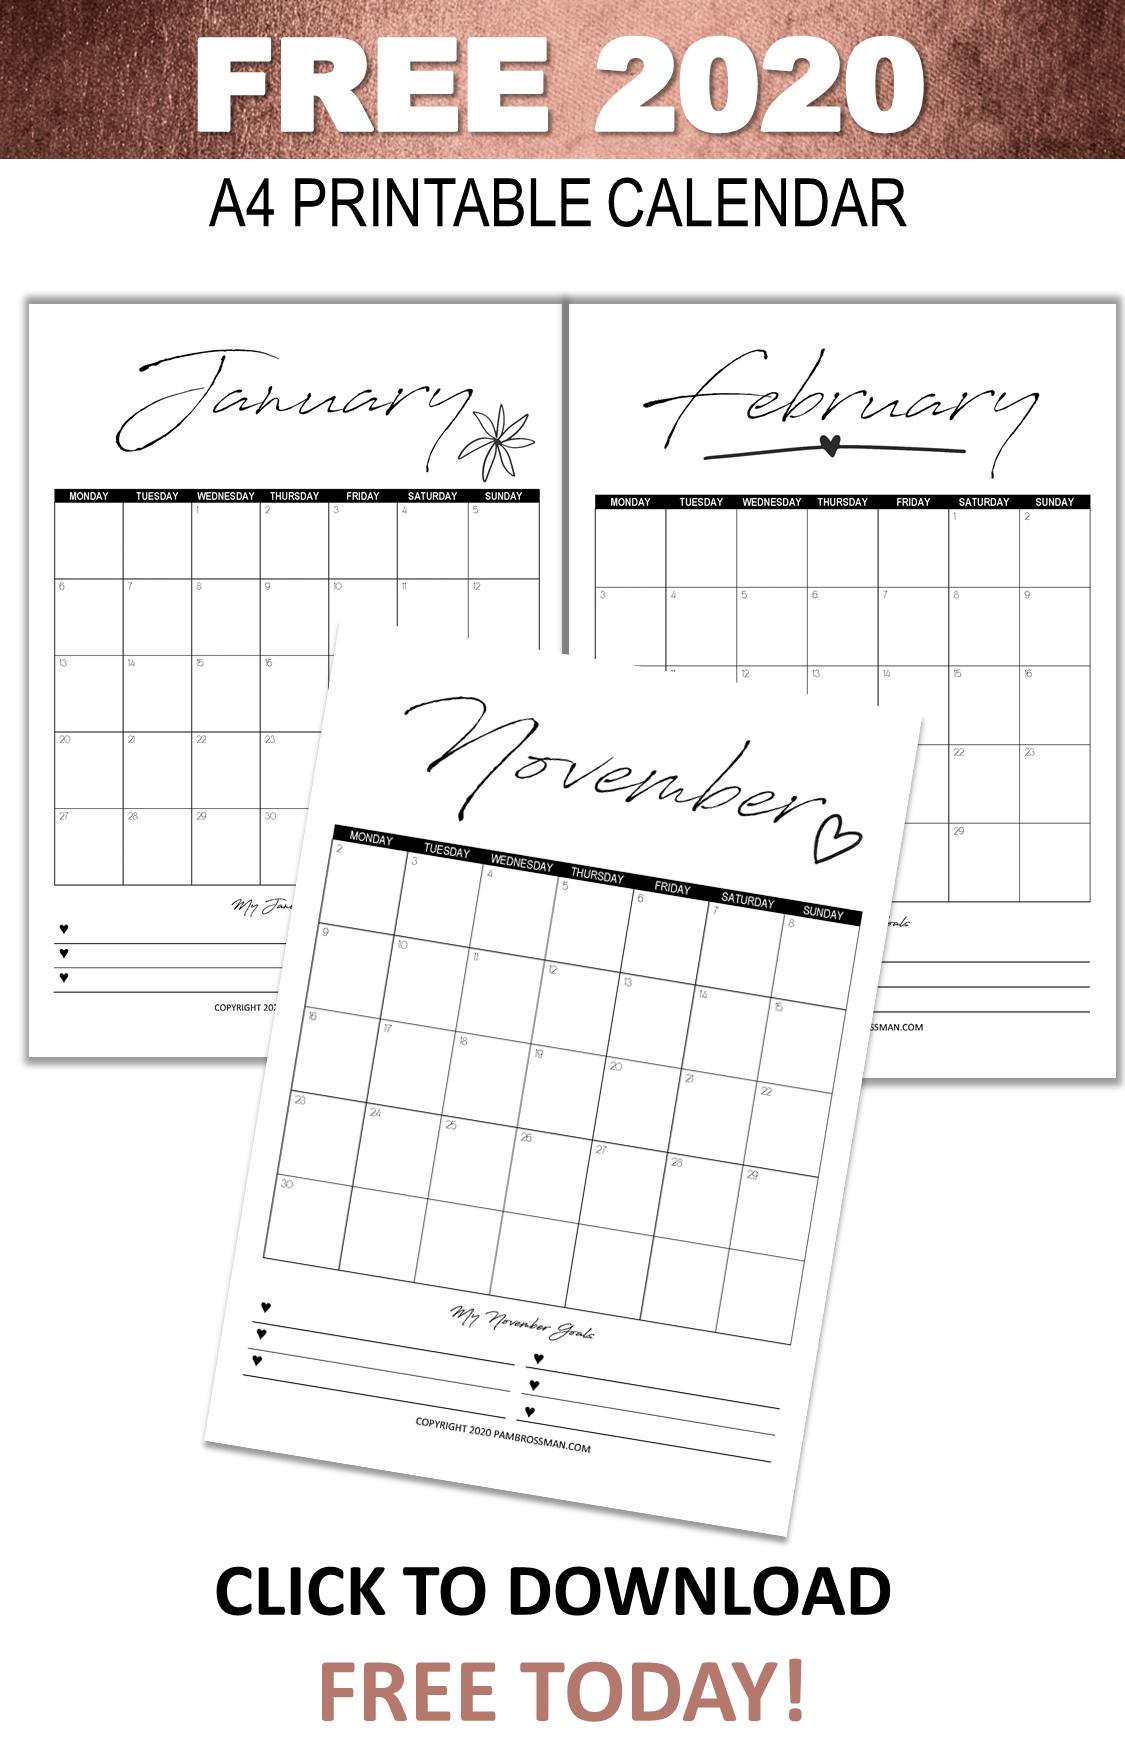 2020 Printable Calendar Goals | Free Printable Calendar